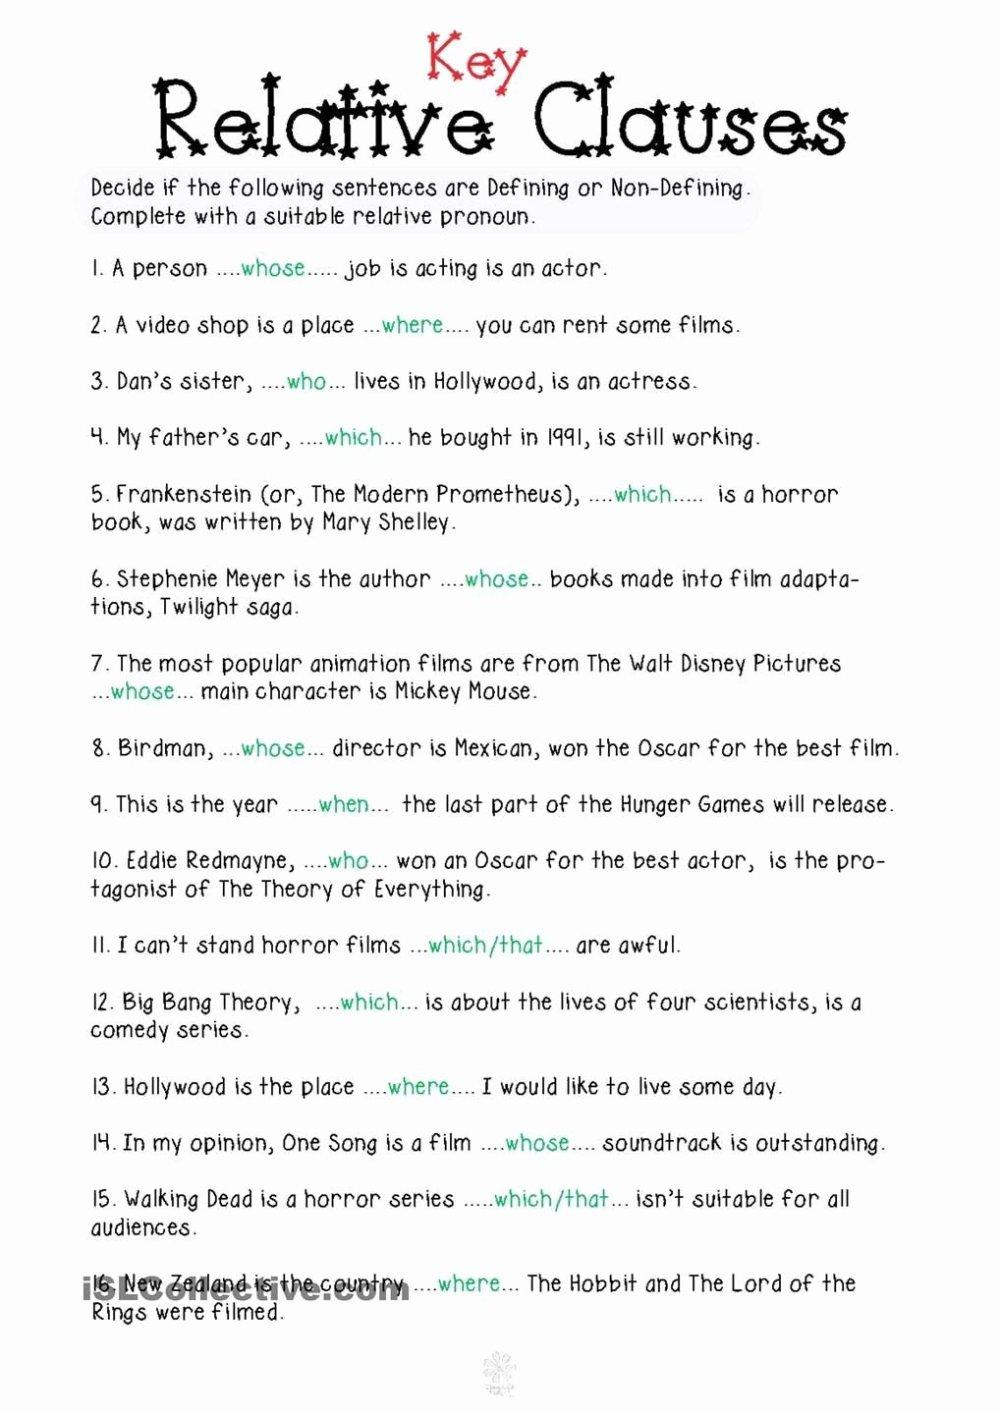 medium resolution of Relative Pronouns Worksheets 4th Grade Lovely Relative Pronouns Worksheet  Grade 4 Relative Clauses In 2020 – Worksheets Ideas Printable